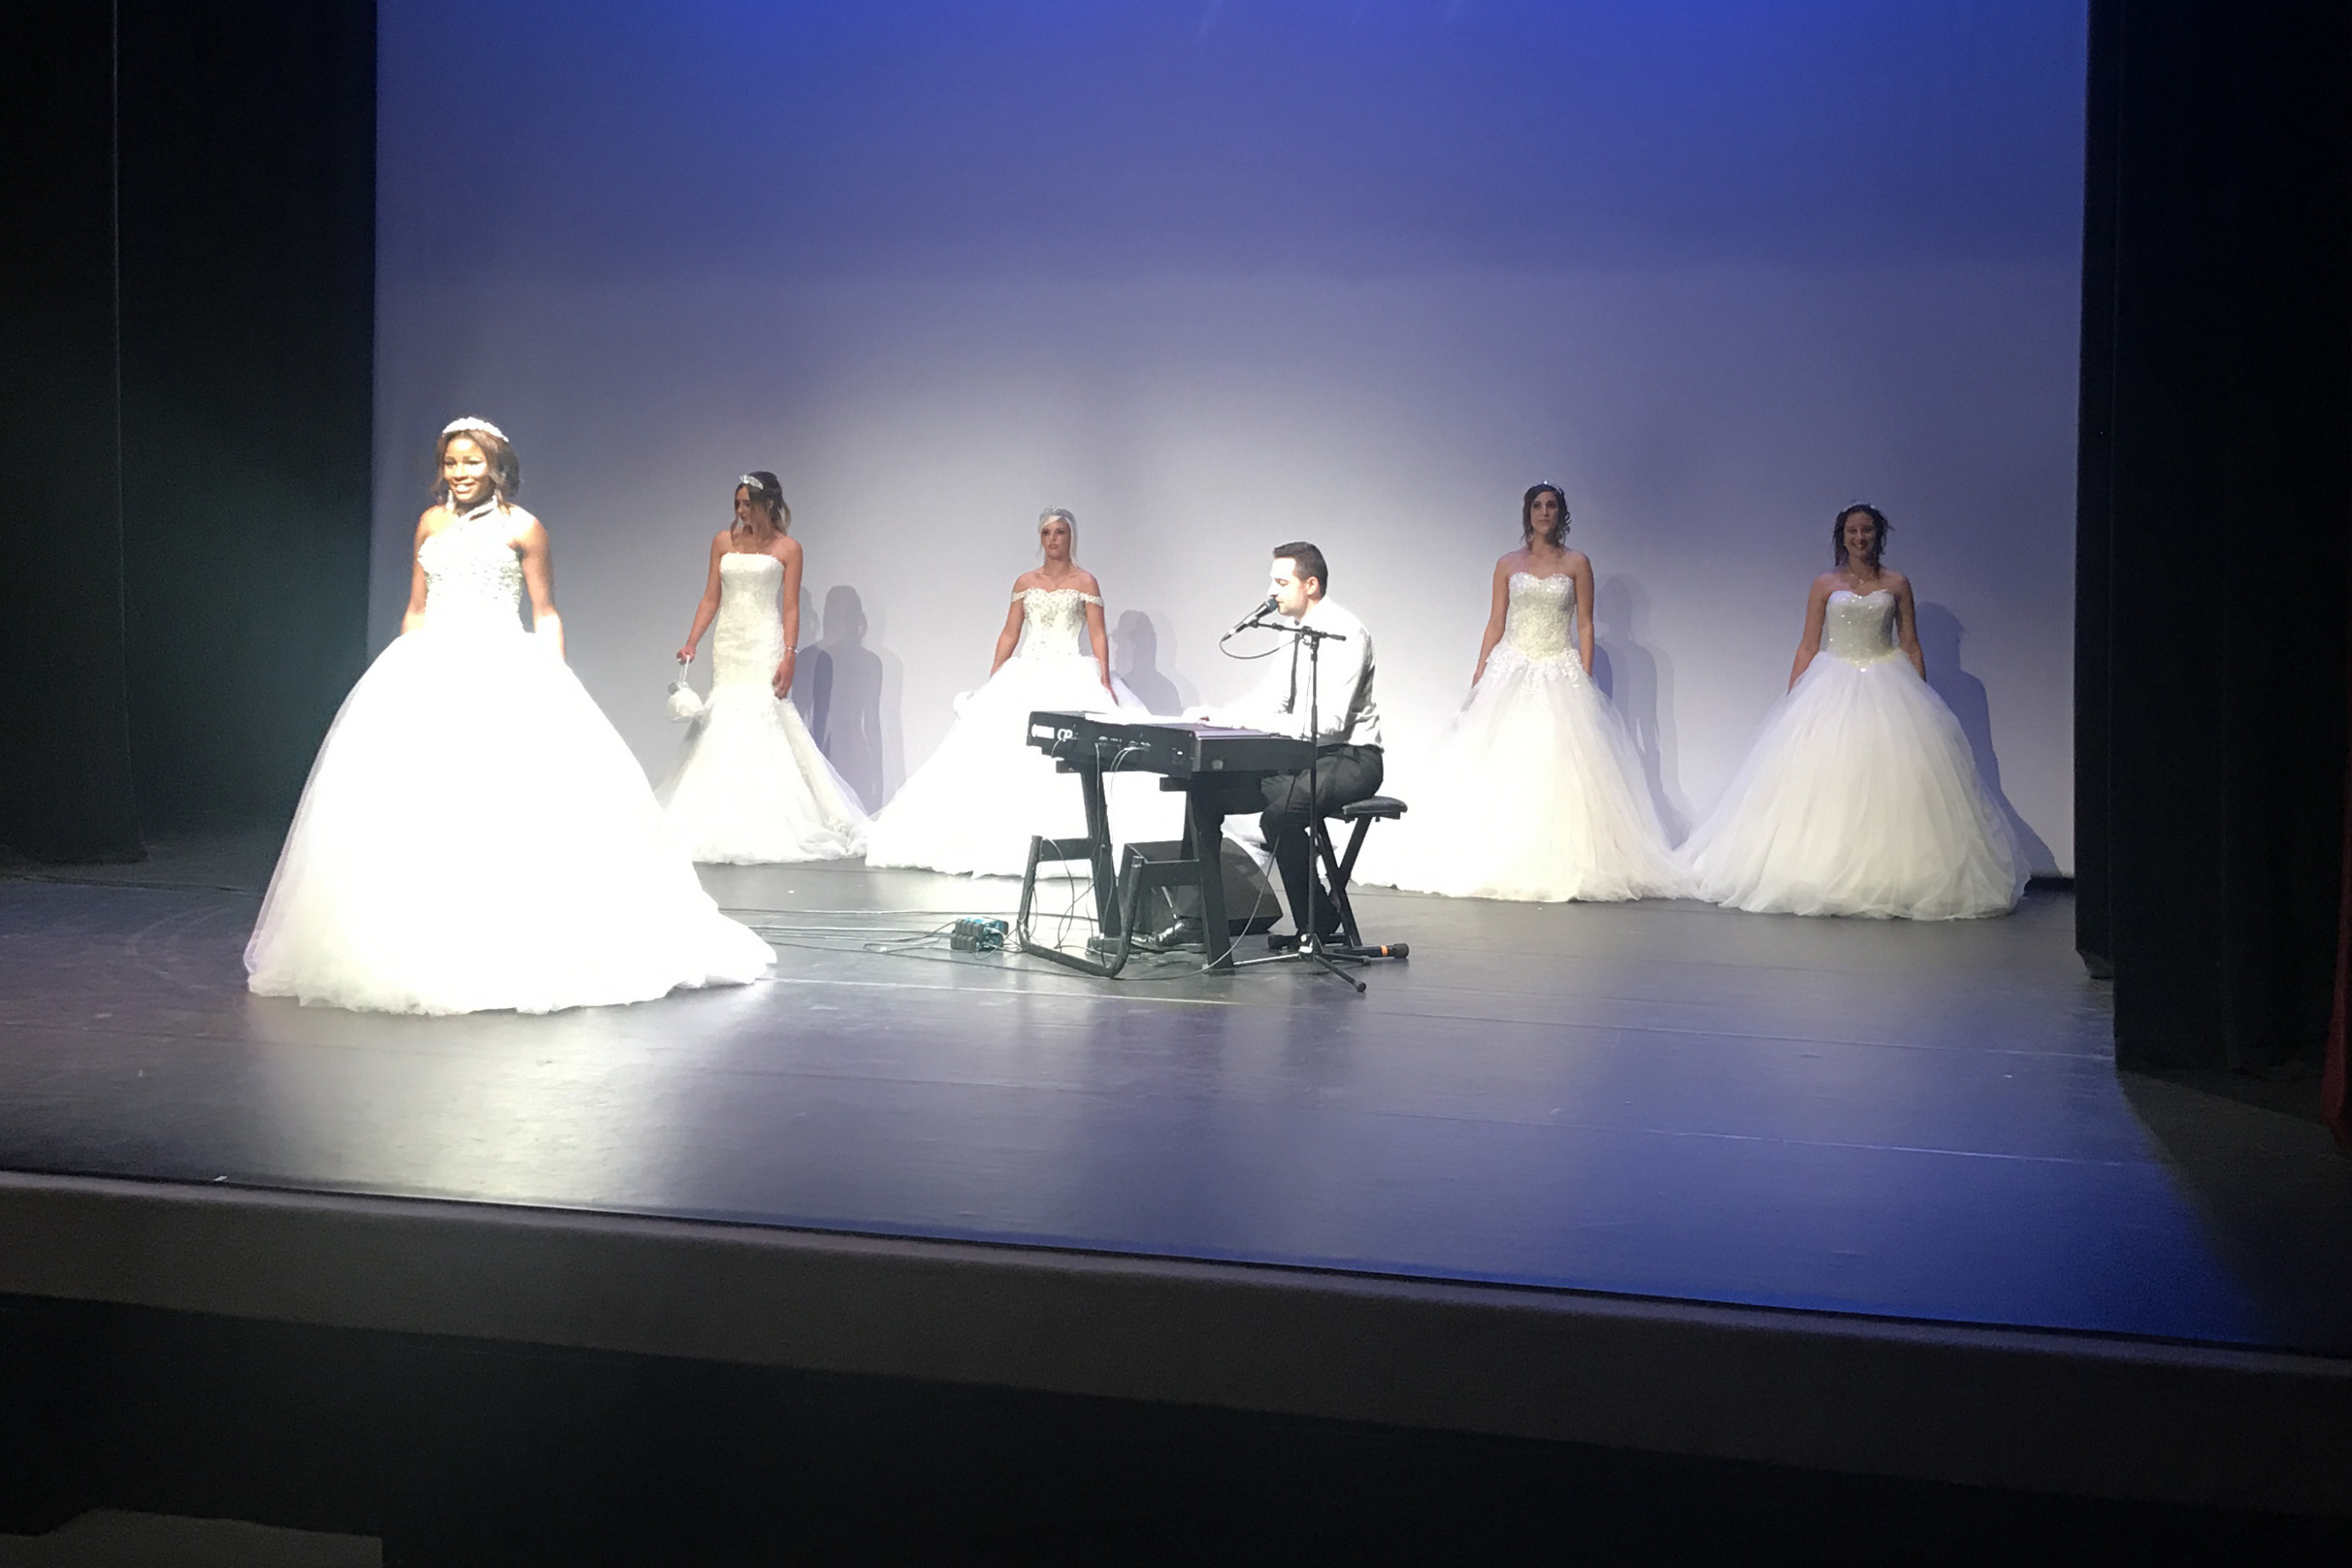 Optredens-005.jpg